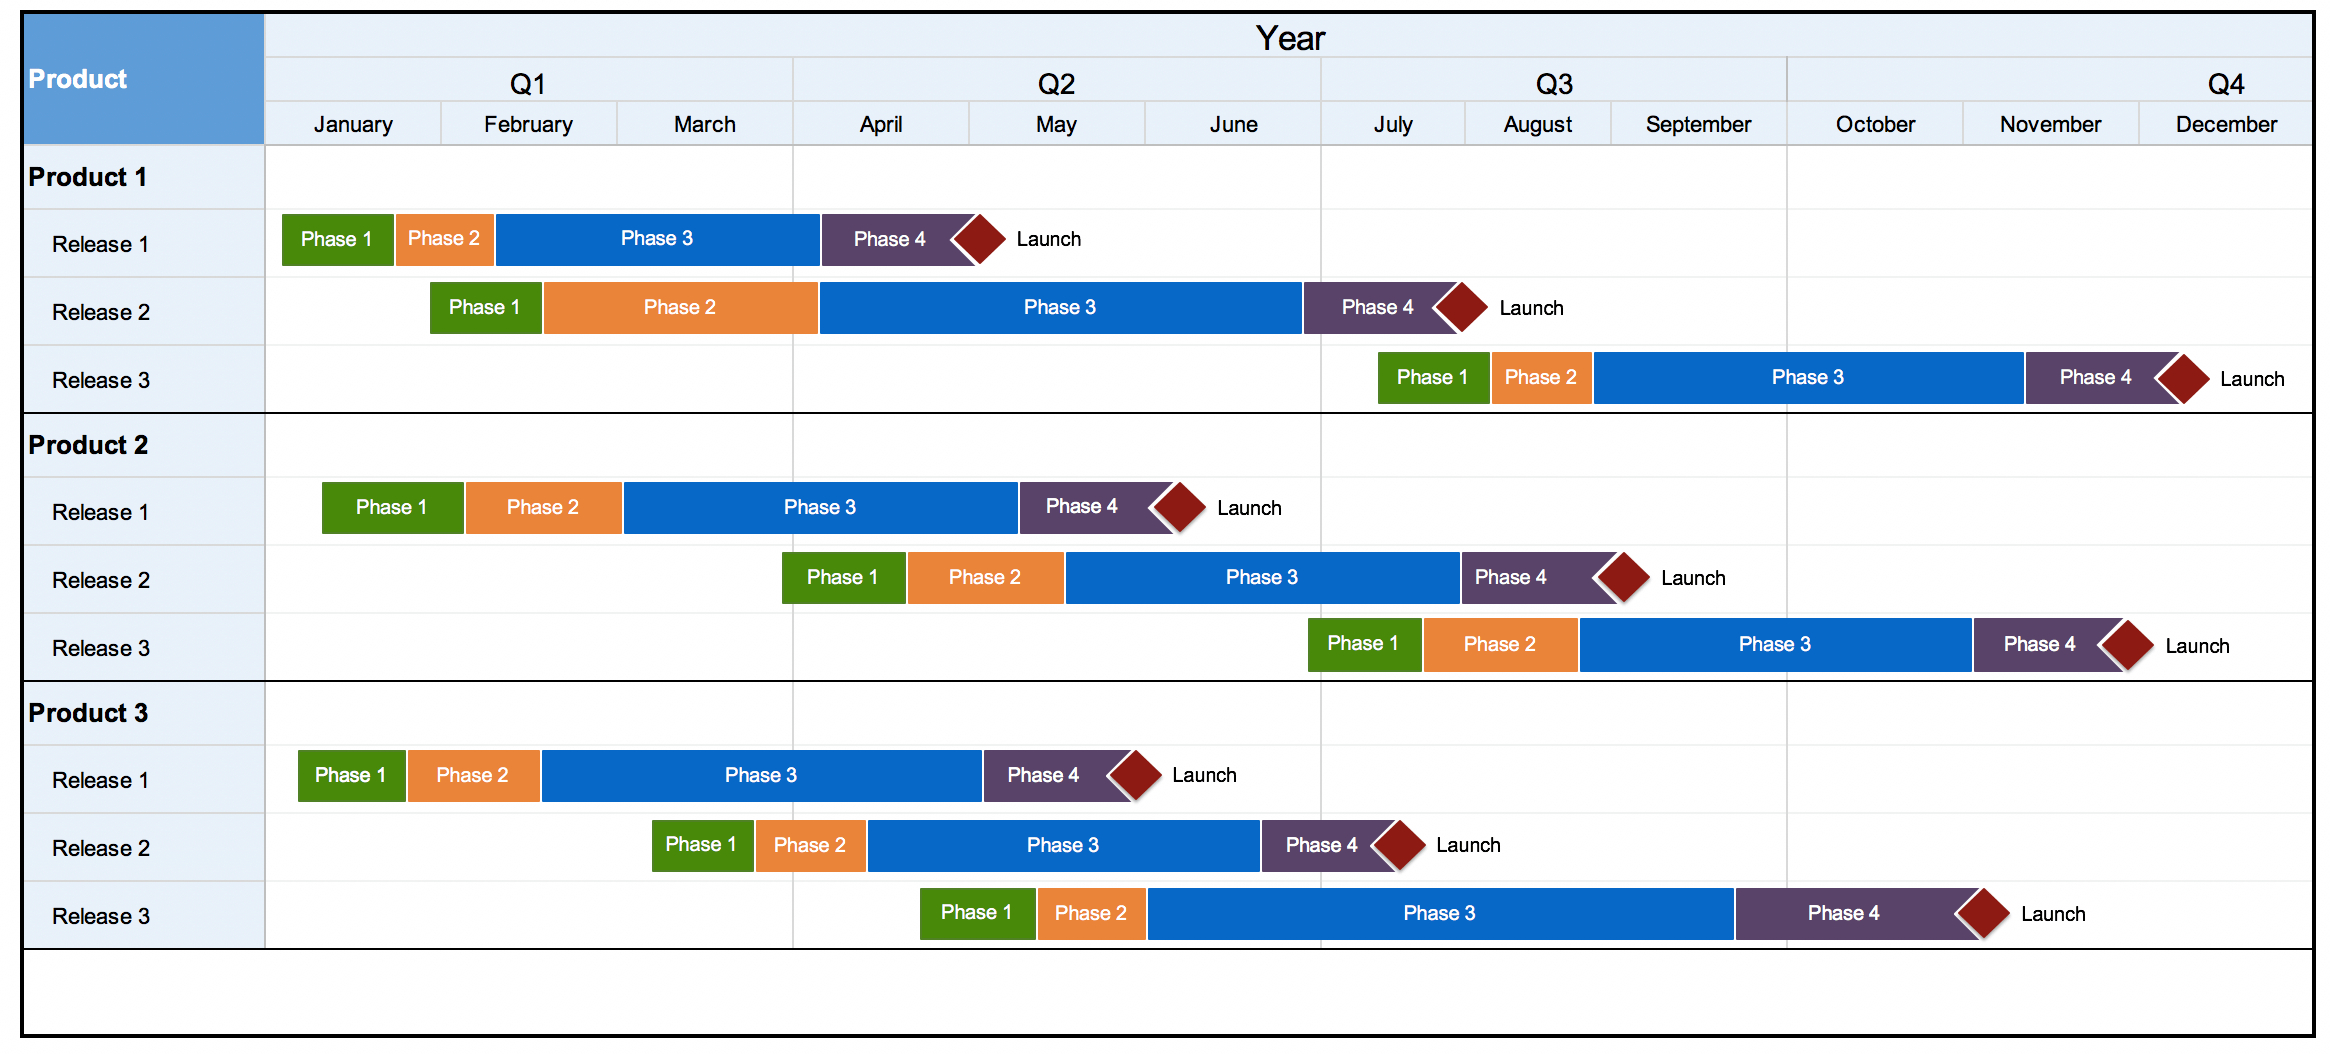 11 Free Gantt Chart Templates | Aha!